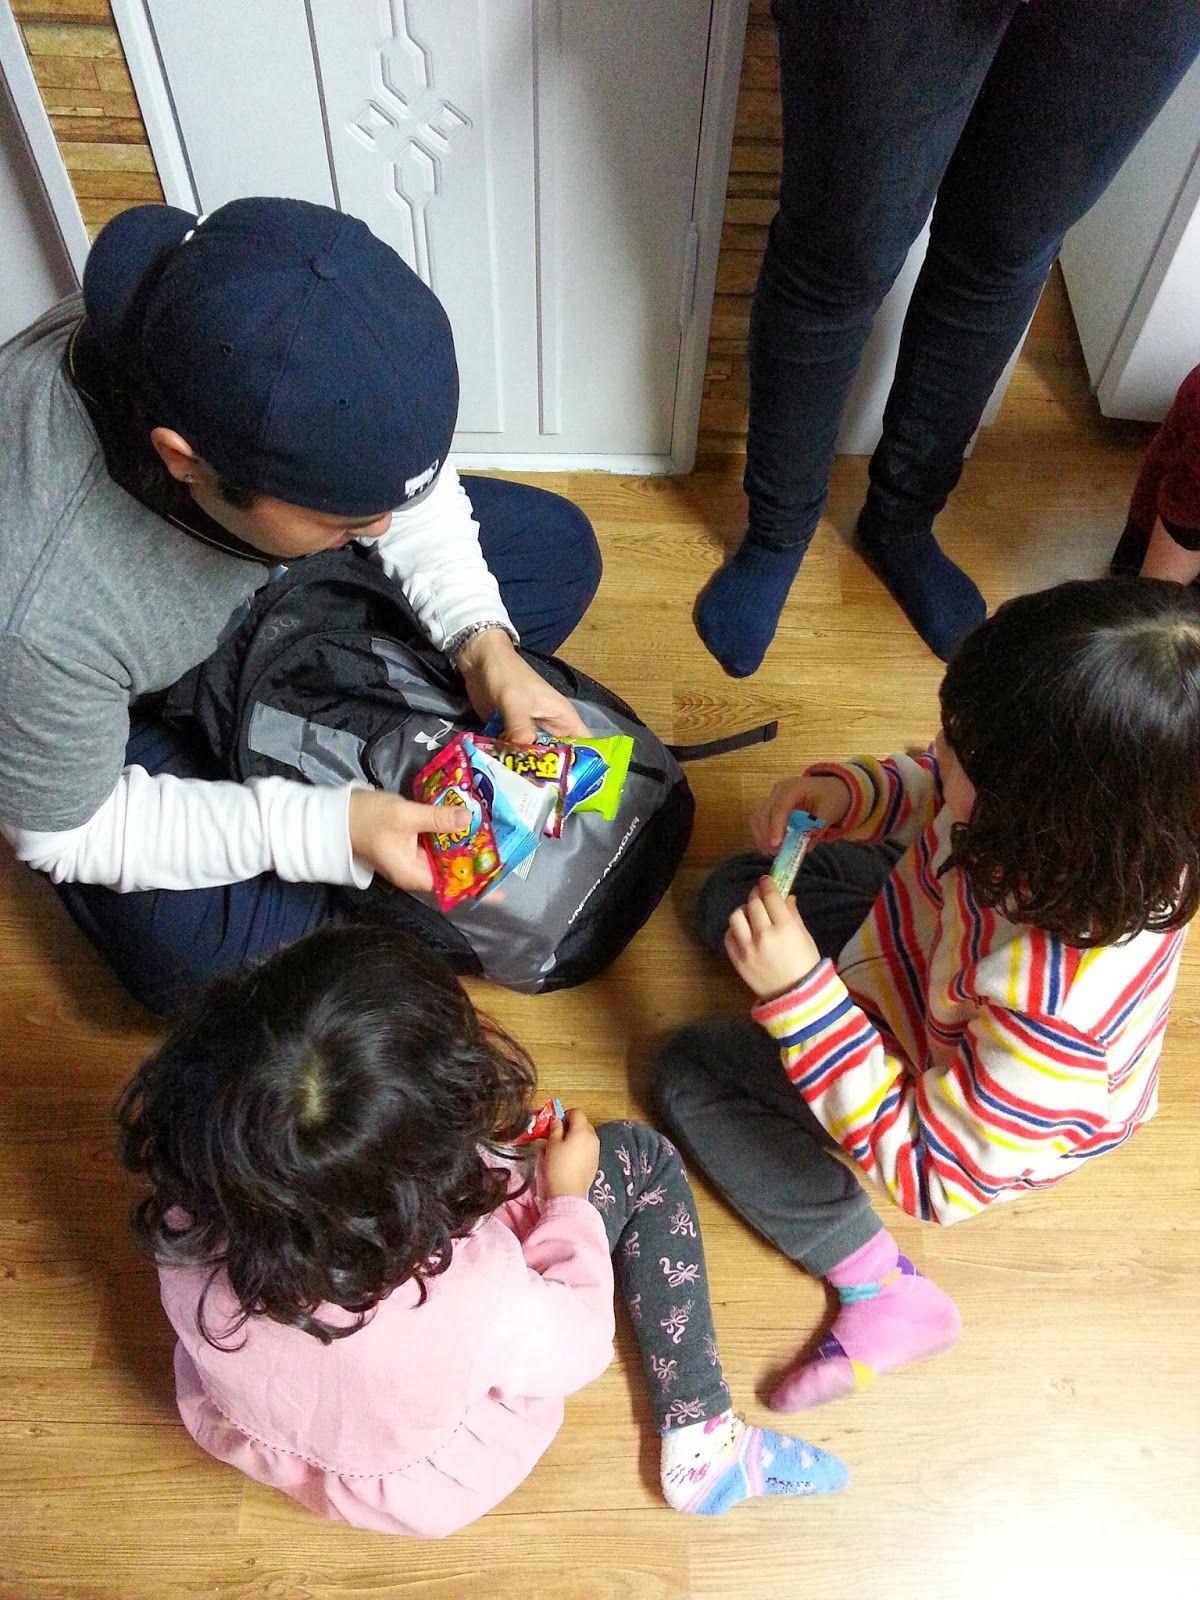 Children and Staff at Samsungwon, Gumi South Korea  #그대로에집엄마를  #네트워크마케팅 #다단계마케팅 #피부관리 #ClassyLadyEntrepreneur    www.RadiantFitAndHappy.com   ⭐️⭐️ www.SkincareInKorea.info